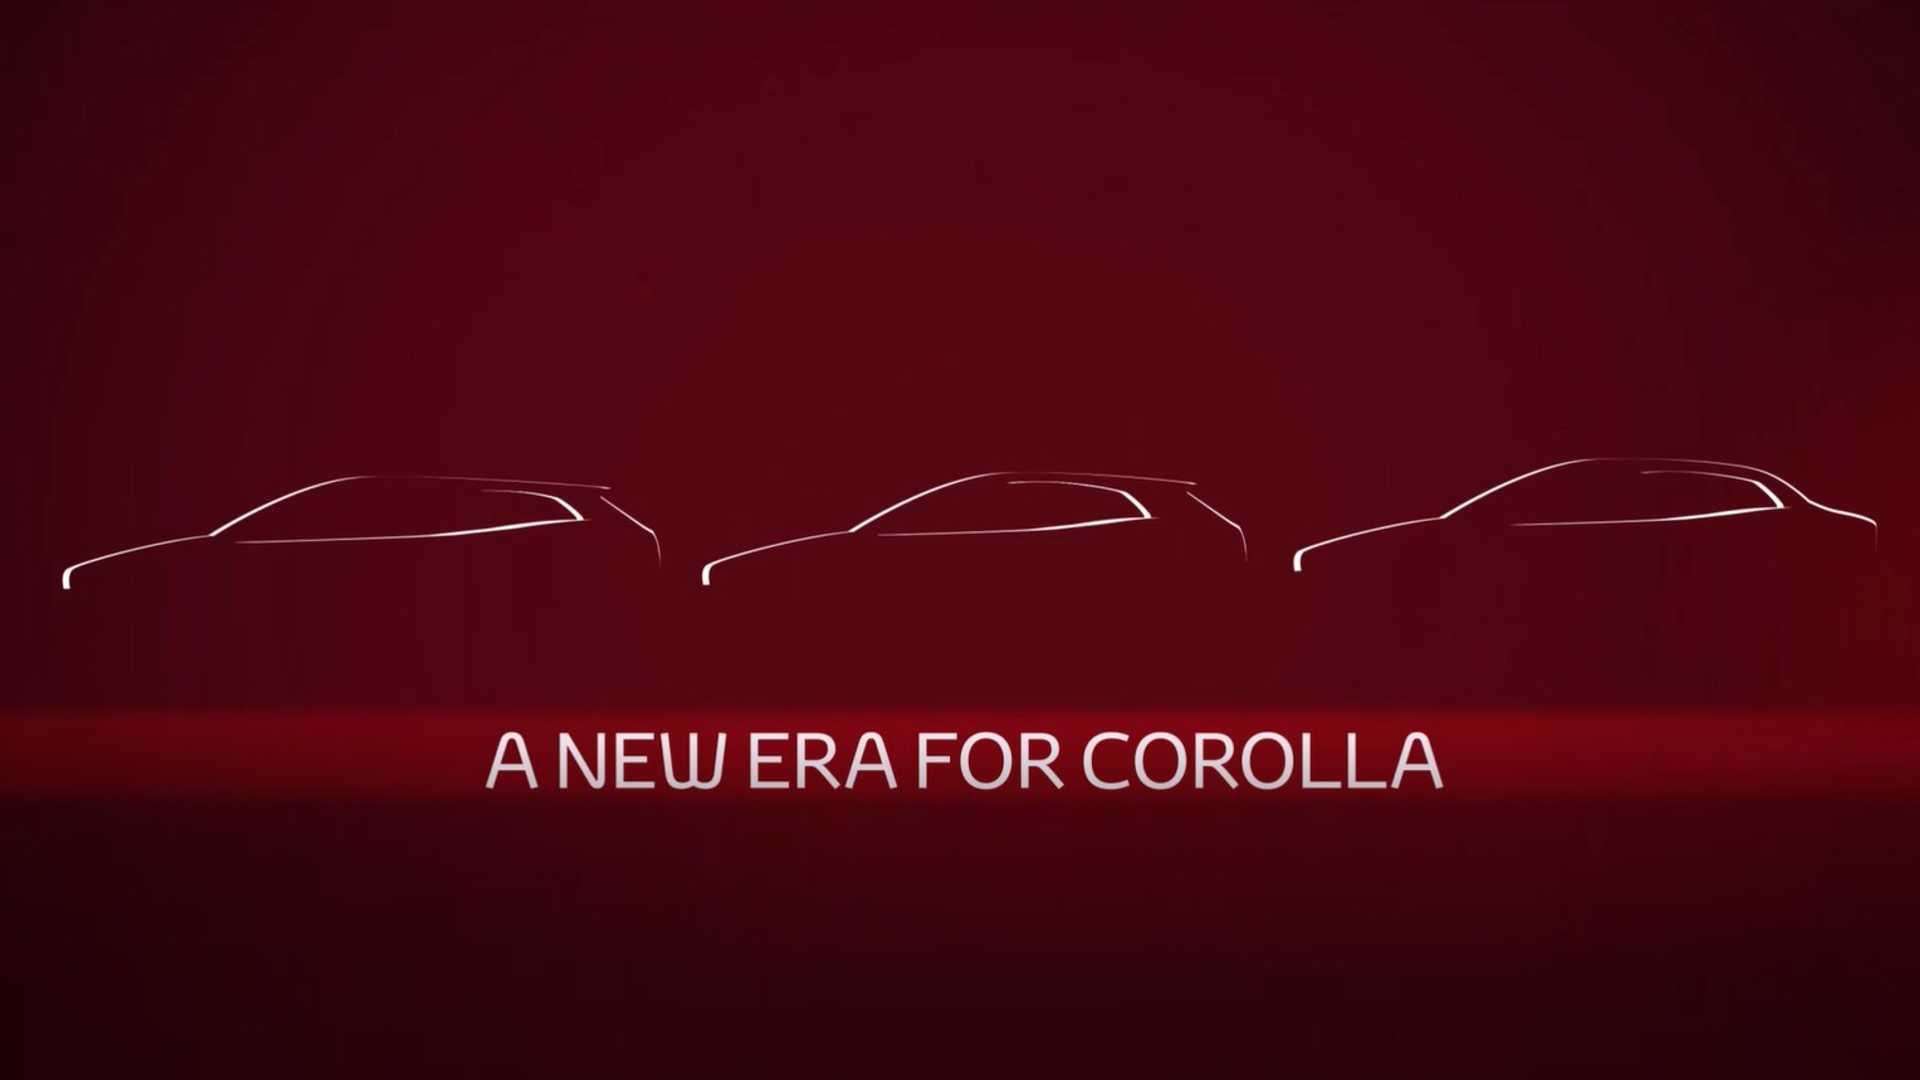 Next Gen Toyota Corolla Altis Teased Ahead of Debut 3